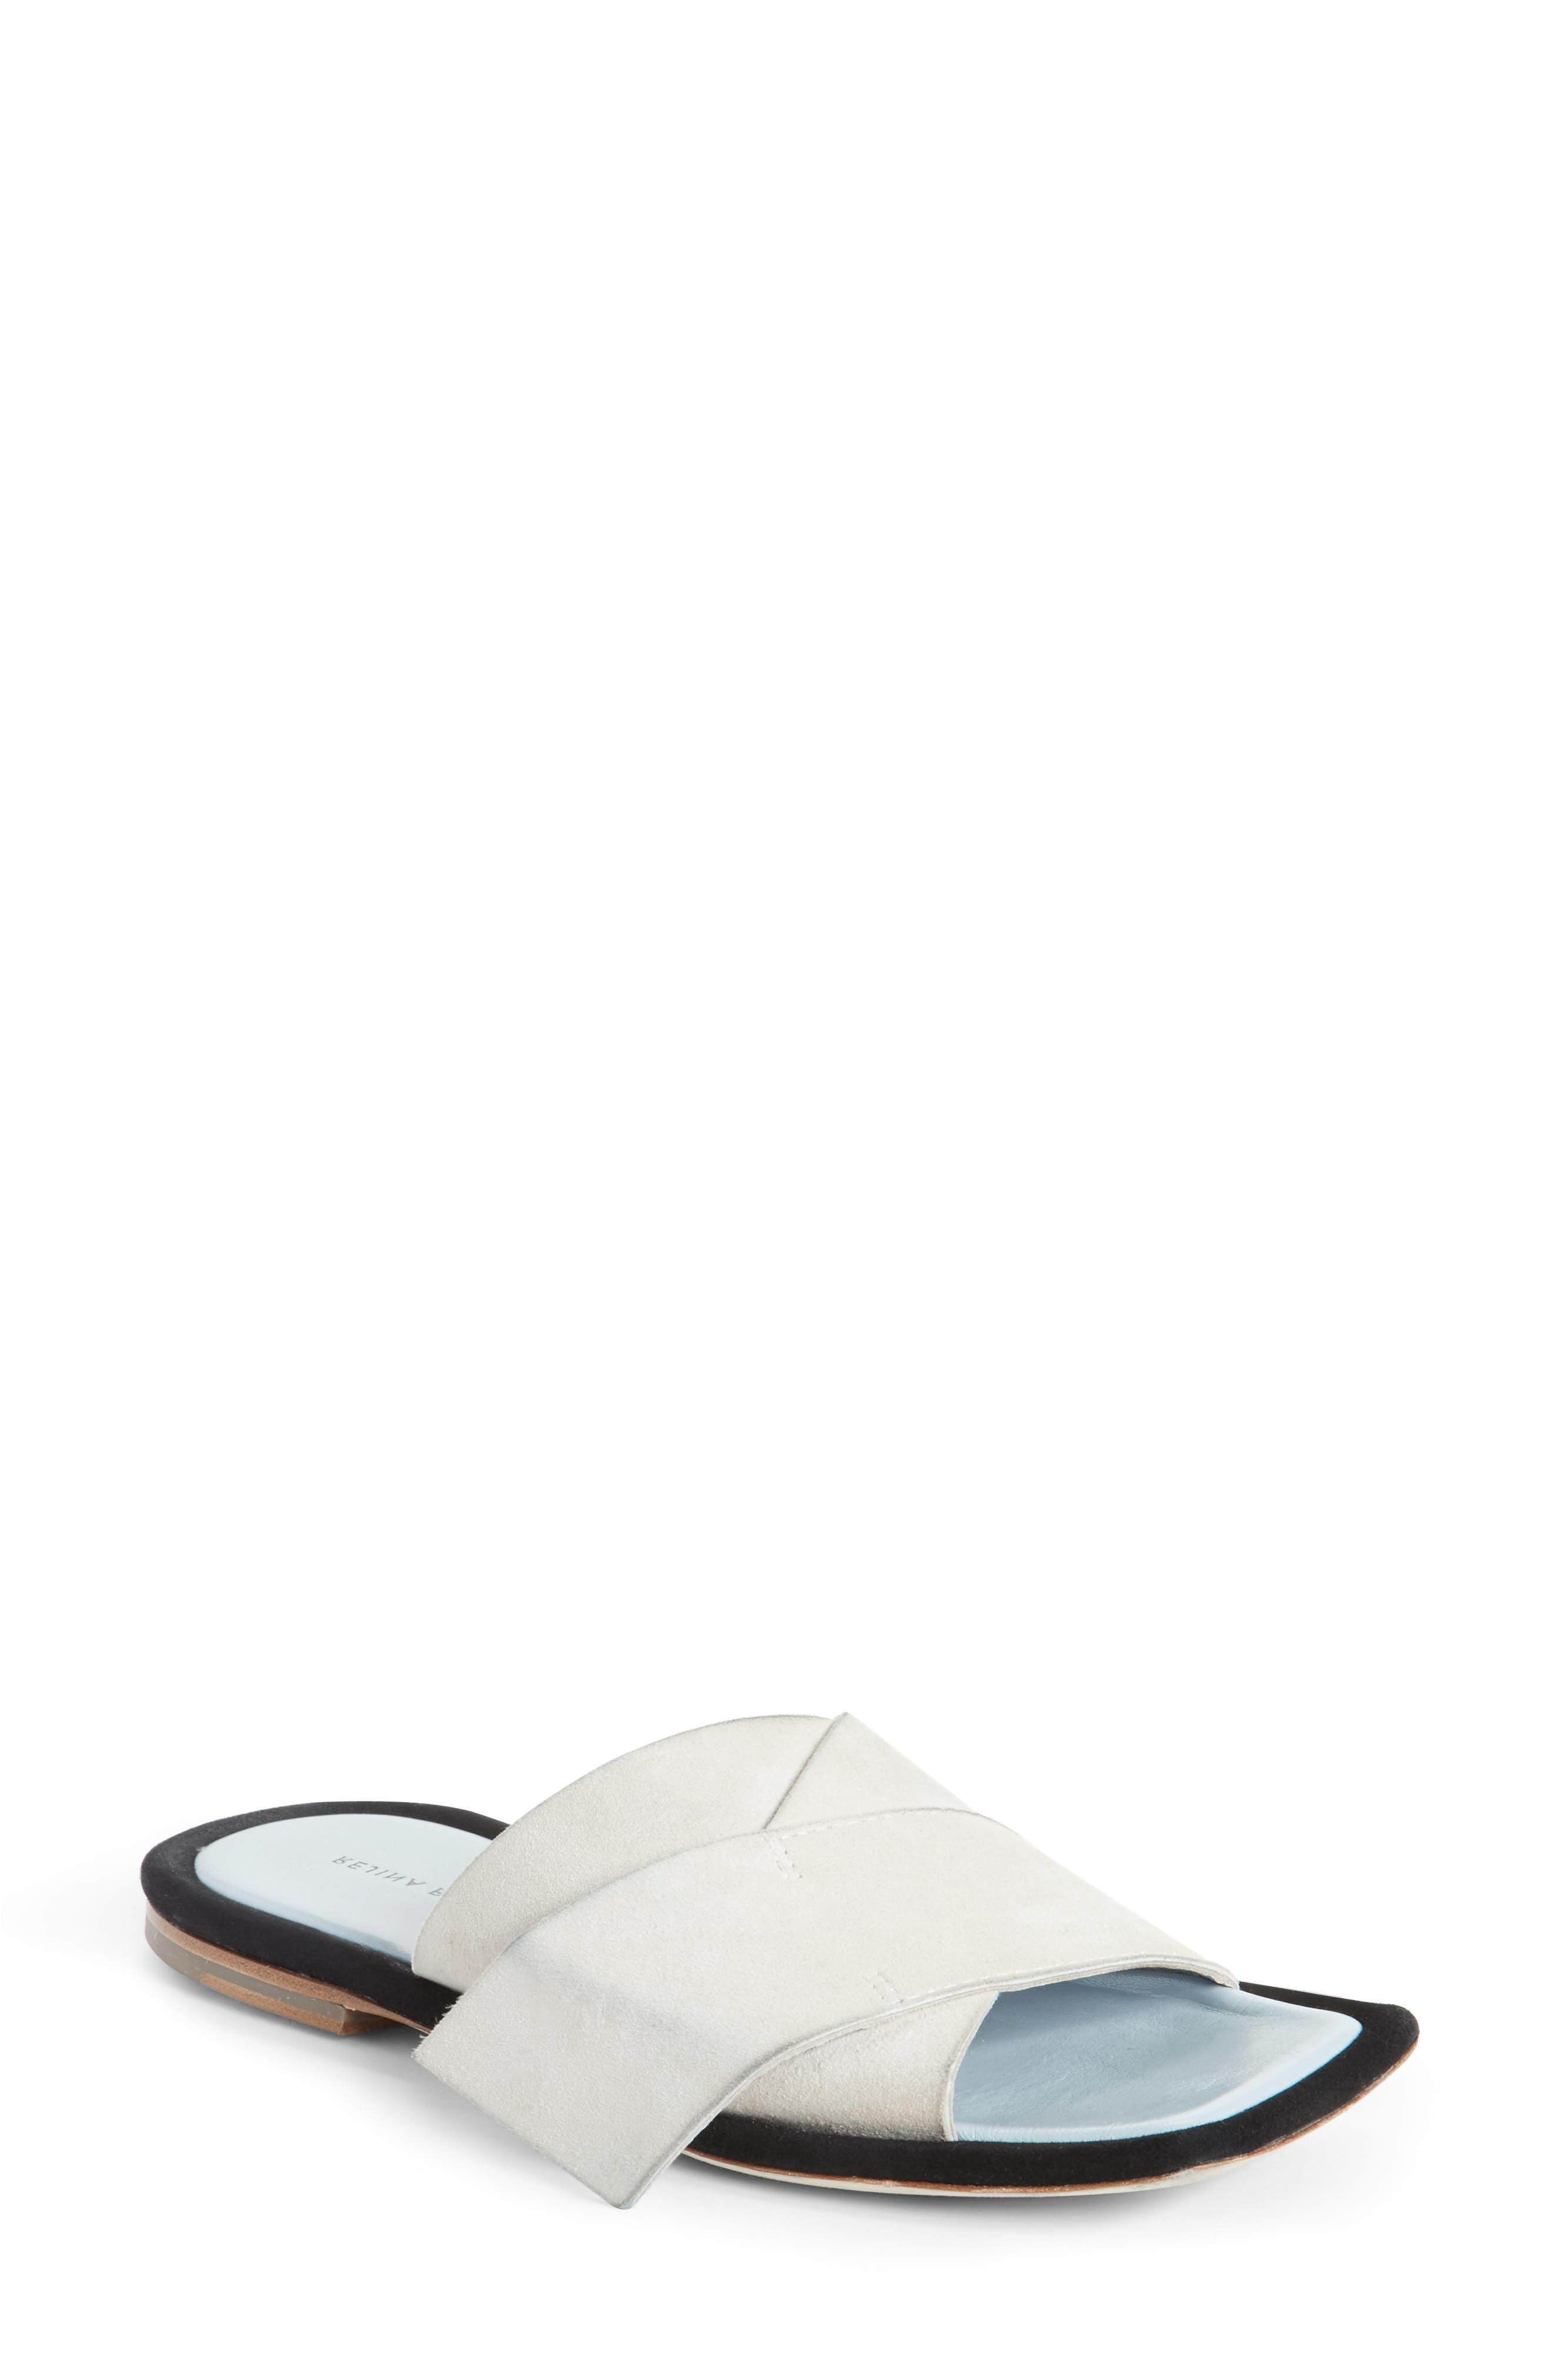 Dara Sandal,                         Main,                         color, Ivory Suede